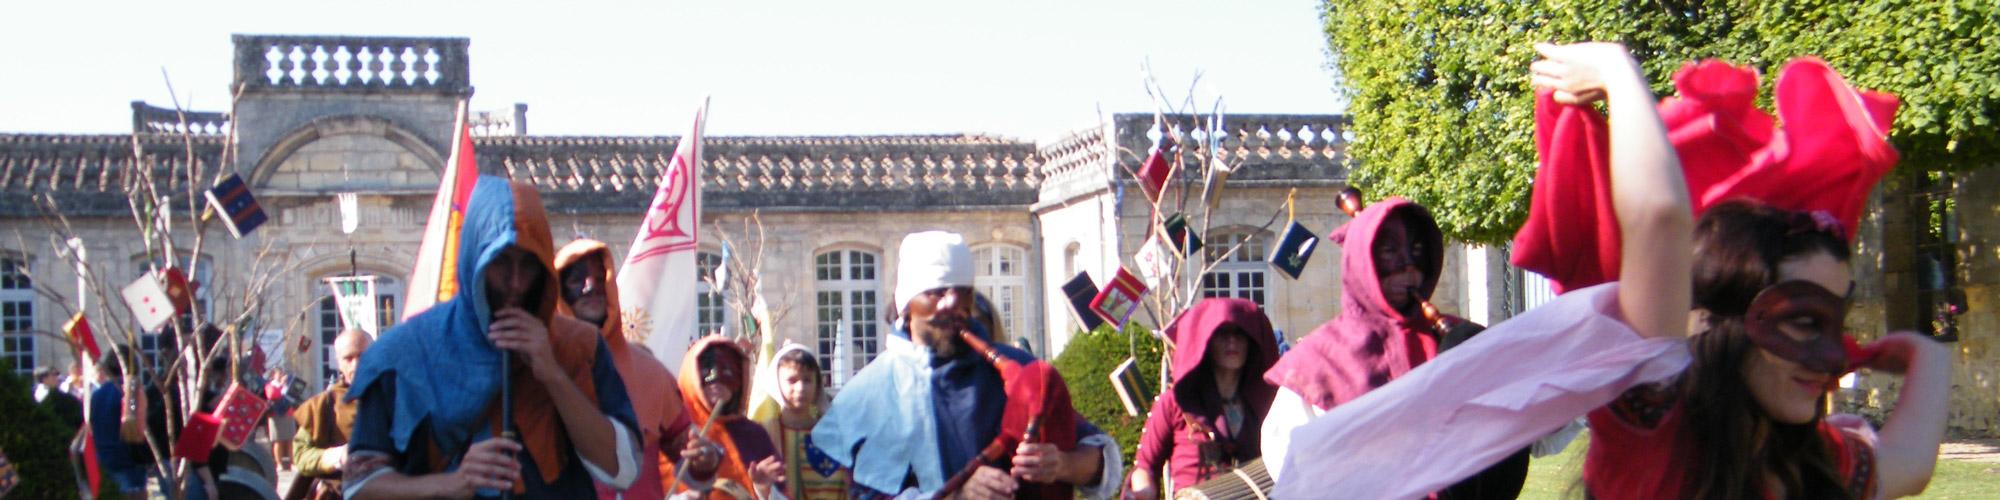 Bourg-gironde-mediavales